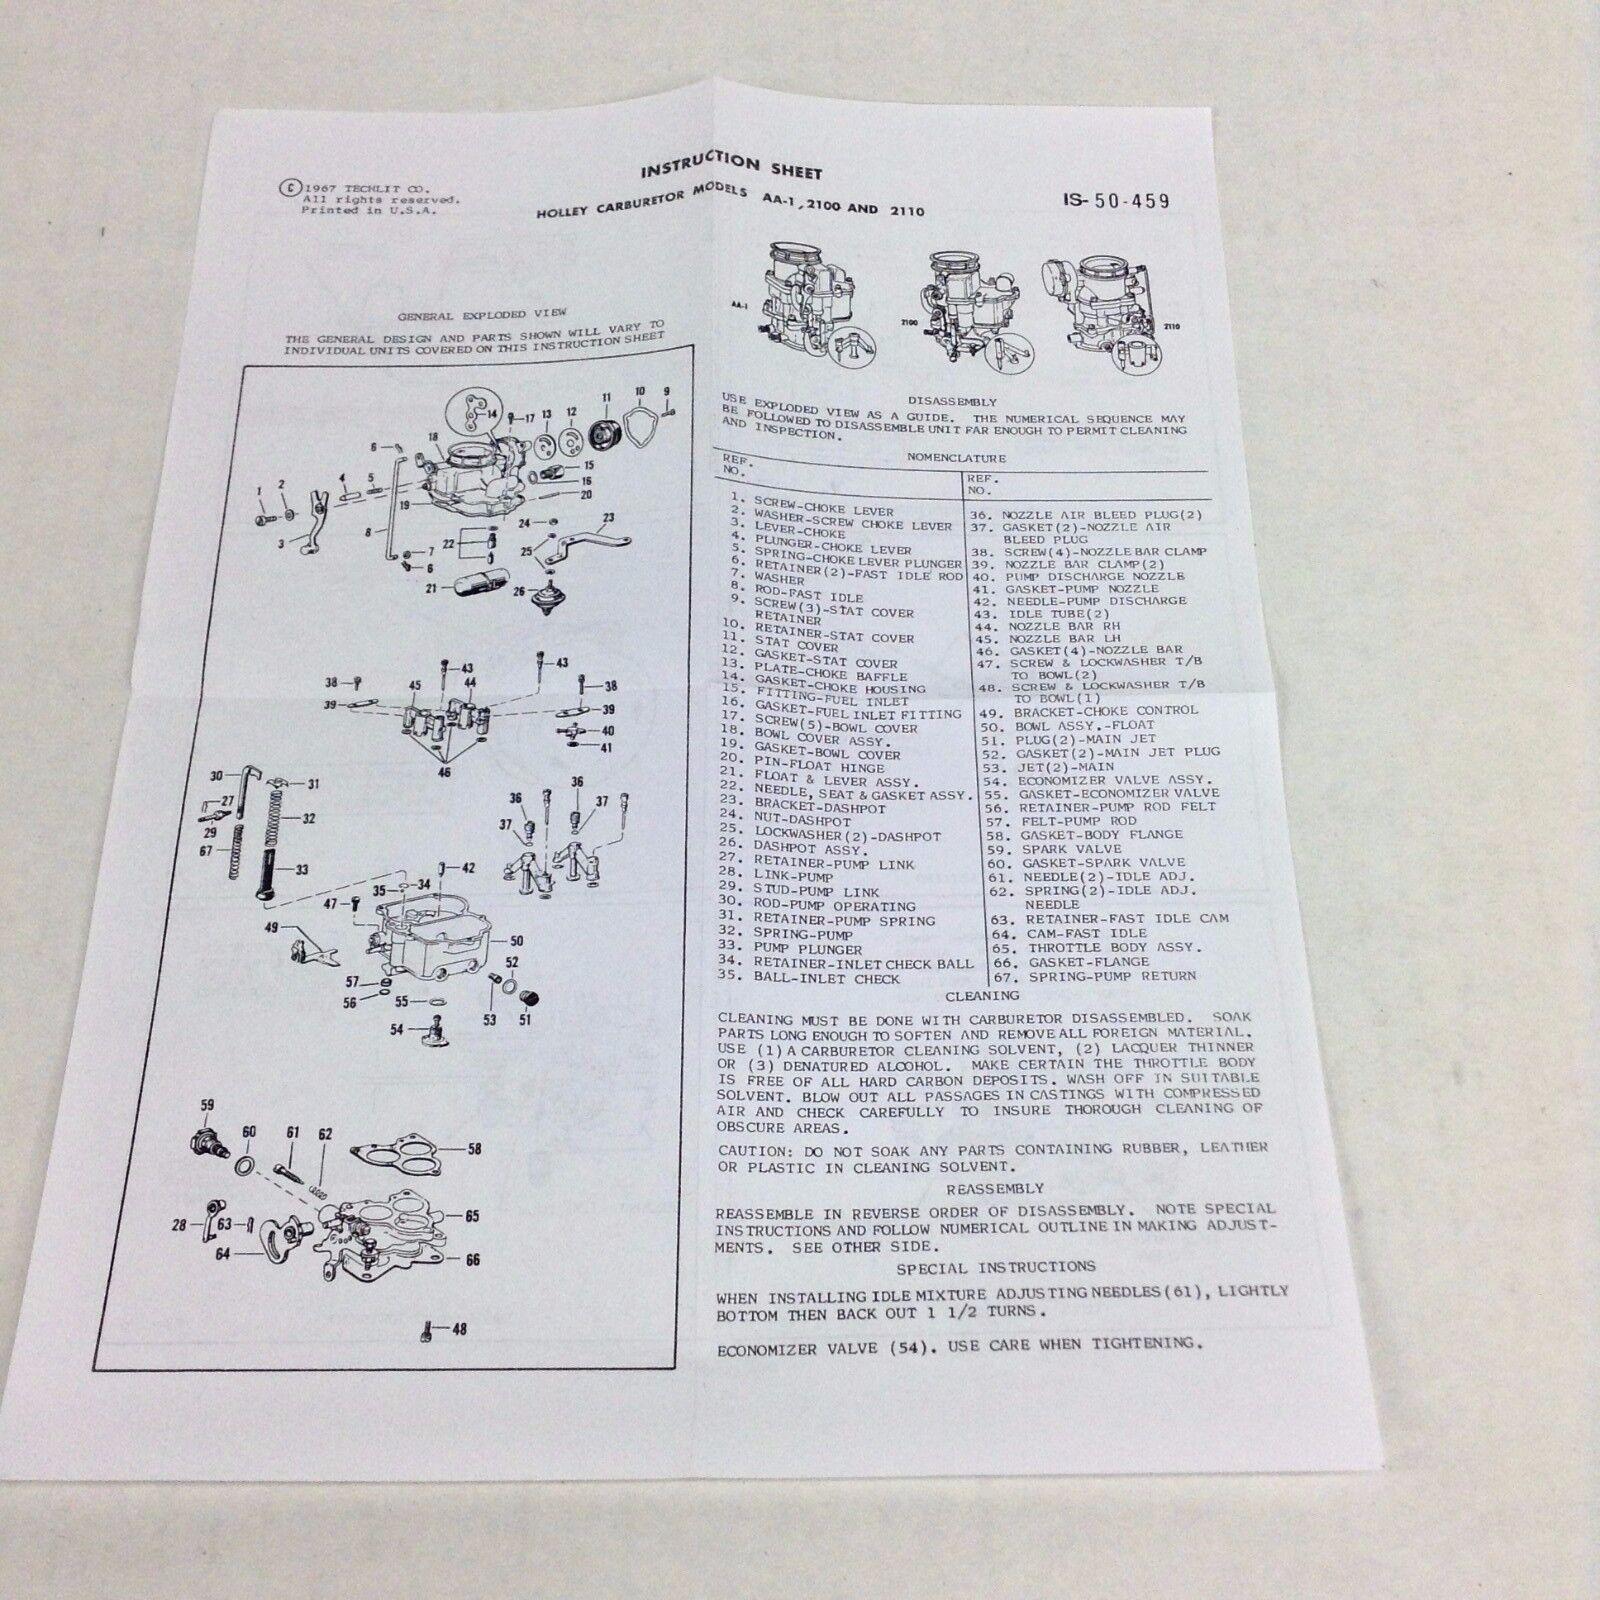 HOLLEY 2210 CARBURETOR KIT 1957-1958 INTERNATIONAL TRUCK BD-264 ENGINES